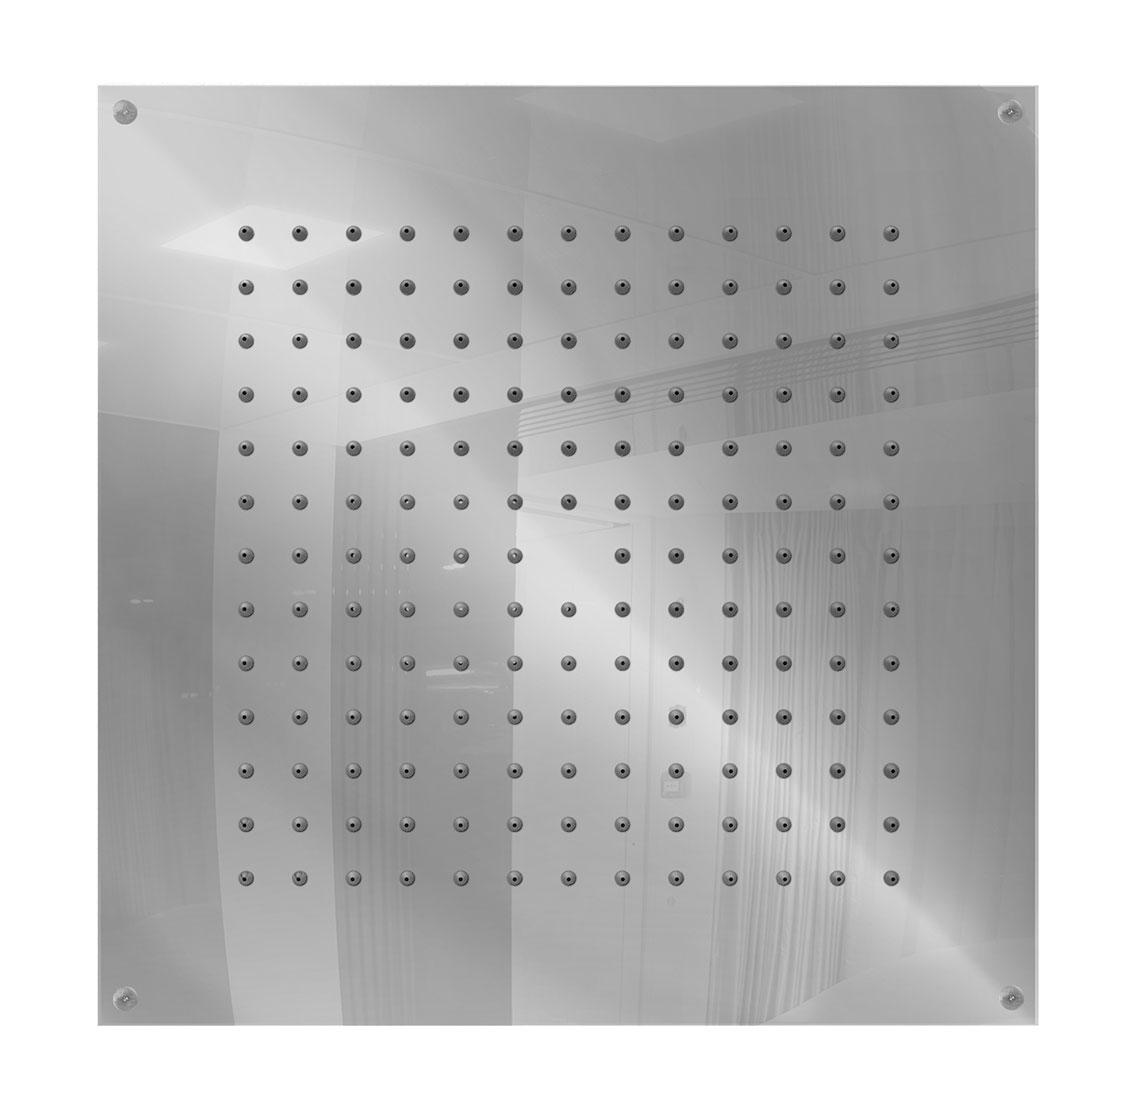 soffione-doccia-acciaio-inos-incasso-kings-350x350-mm-1.jpg